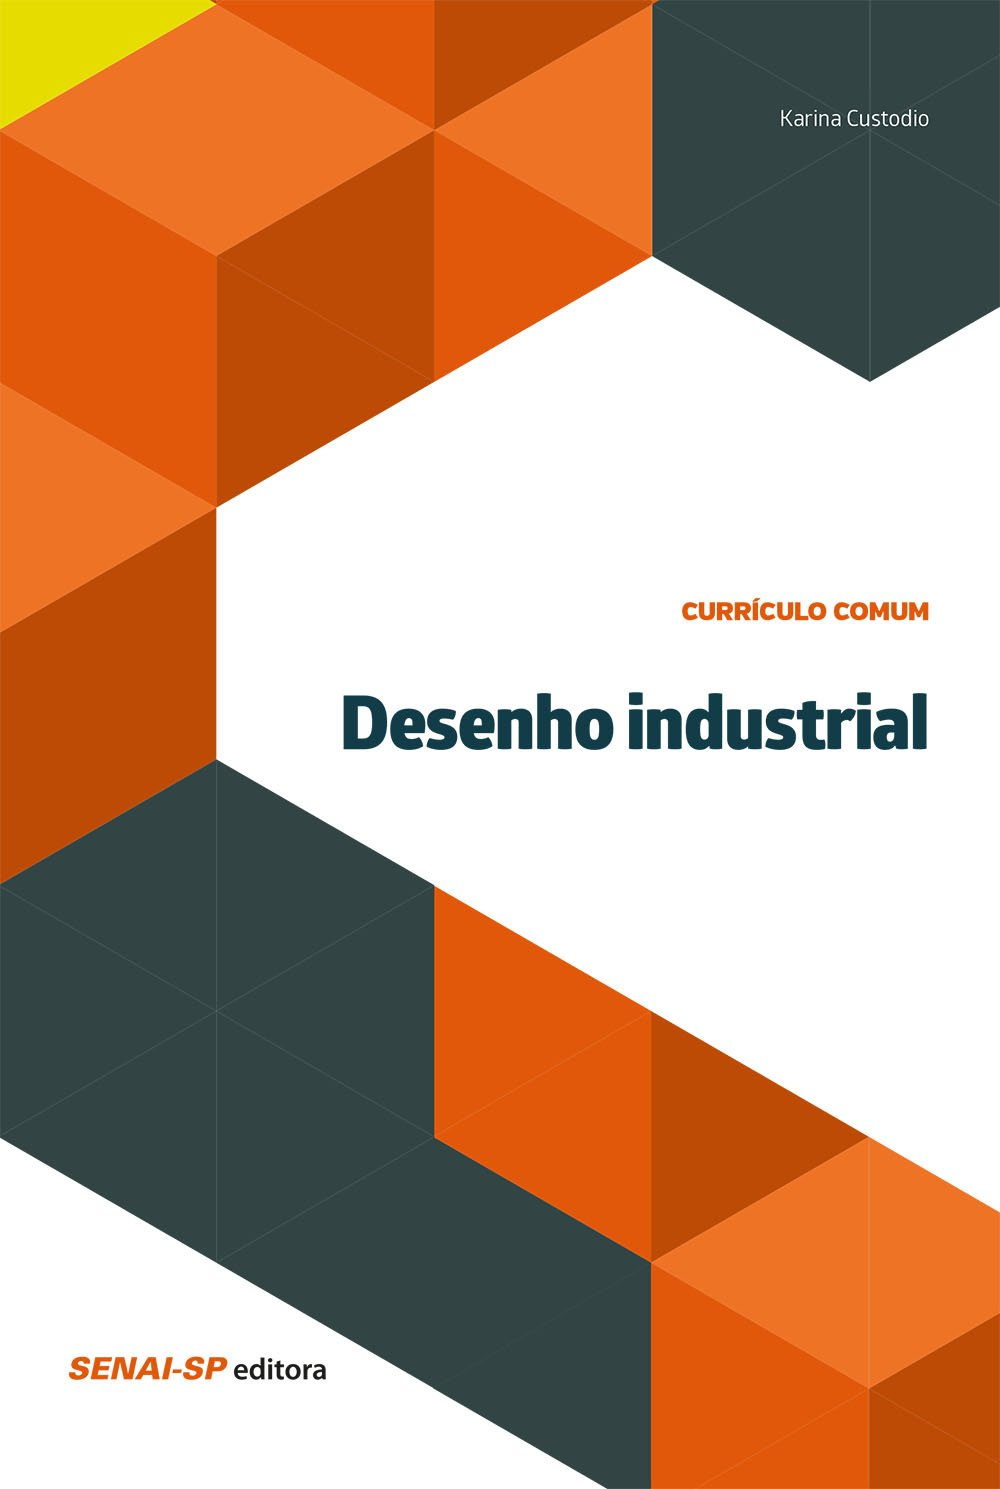 Desenho Industrial: Karina Custódio: 9788583934448: Amazon.com: Books